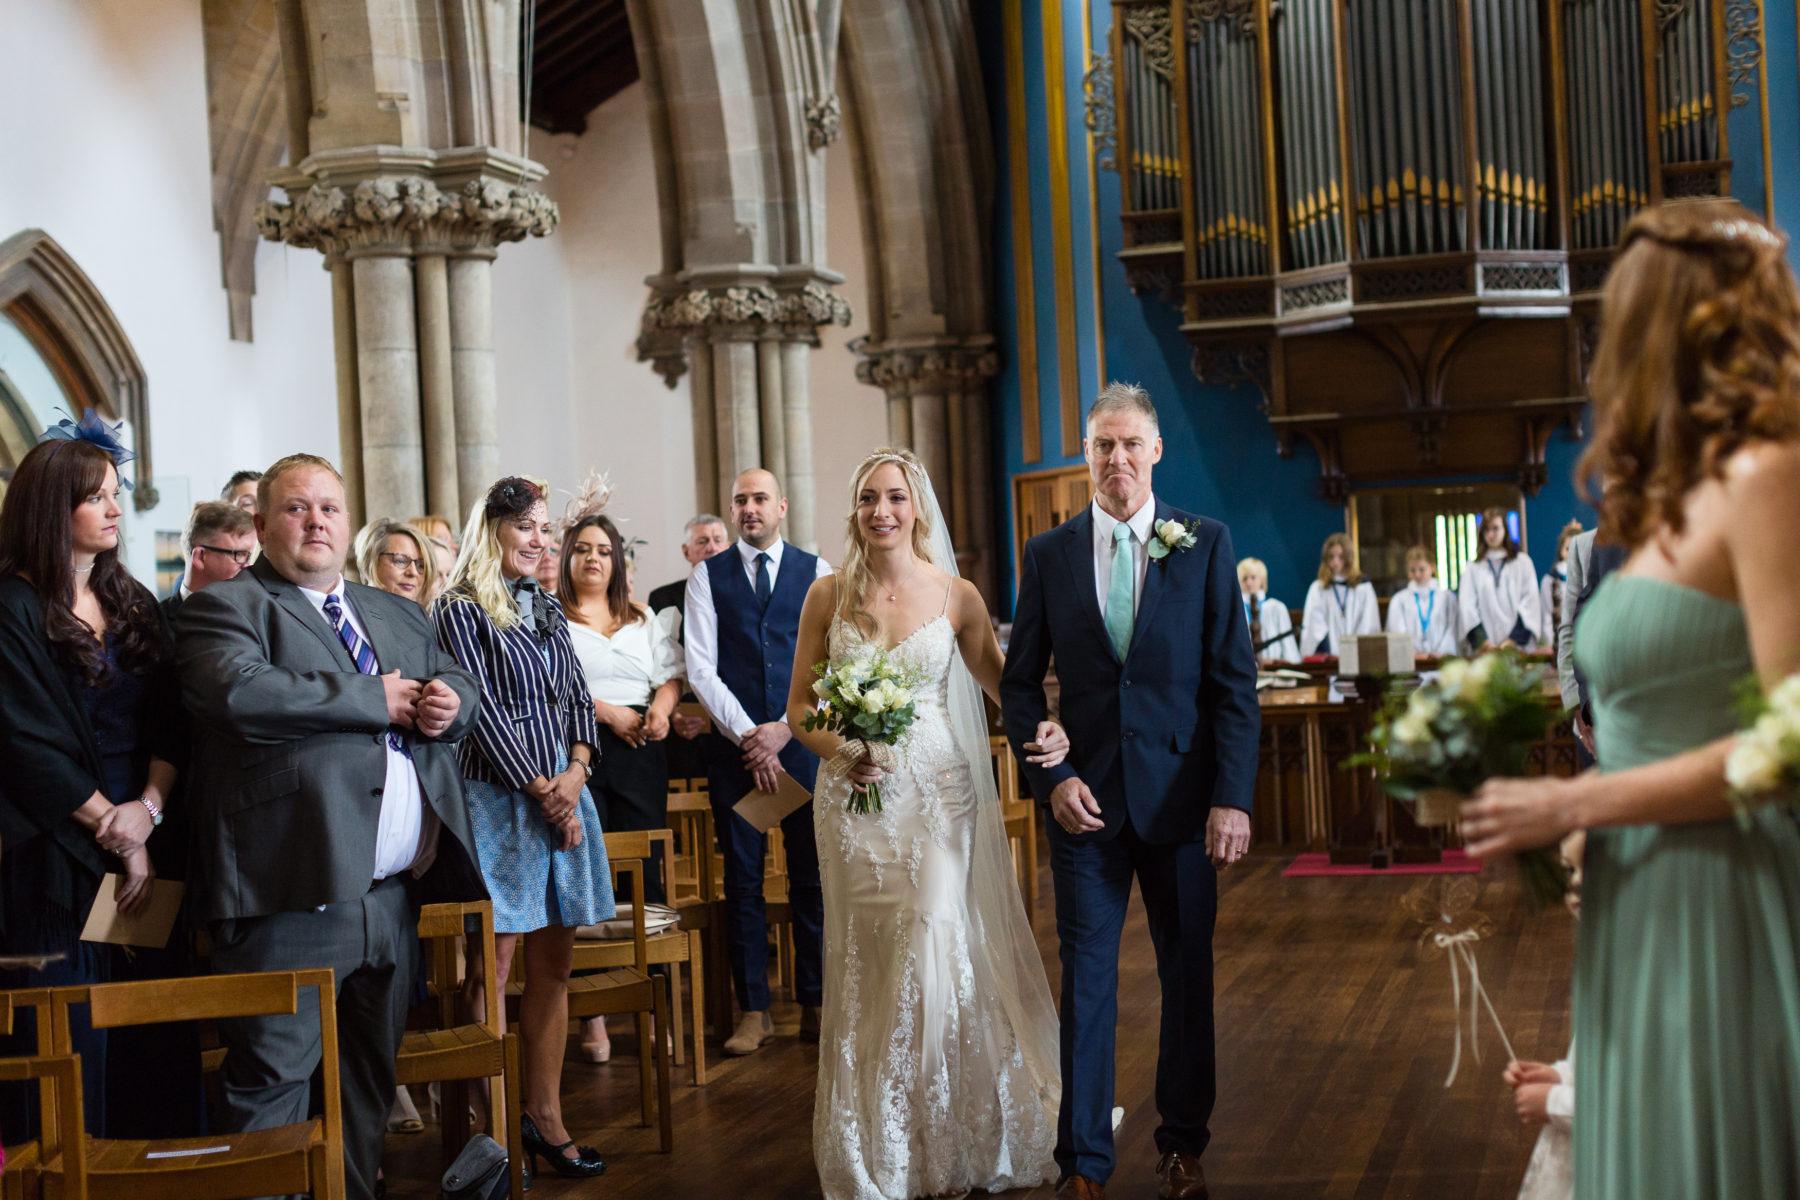 St Johns church wedding harrogate